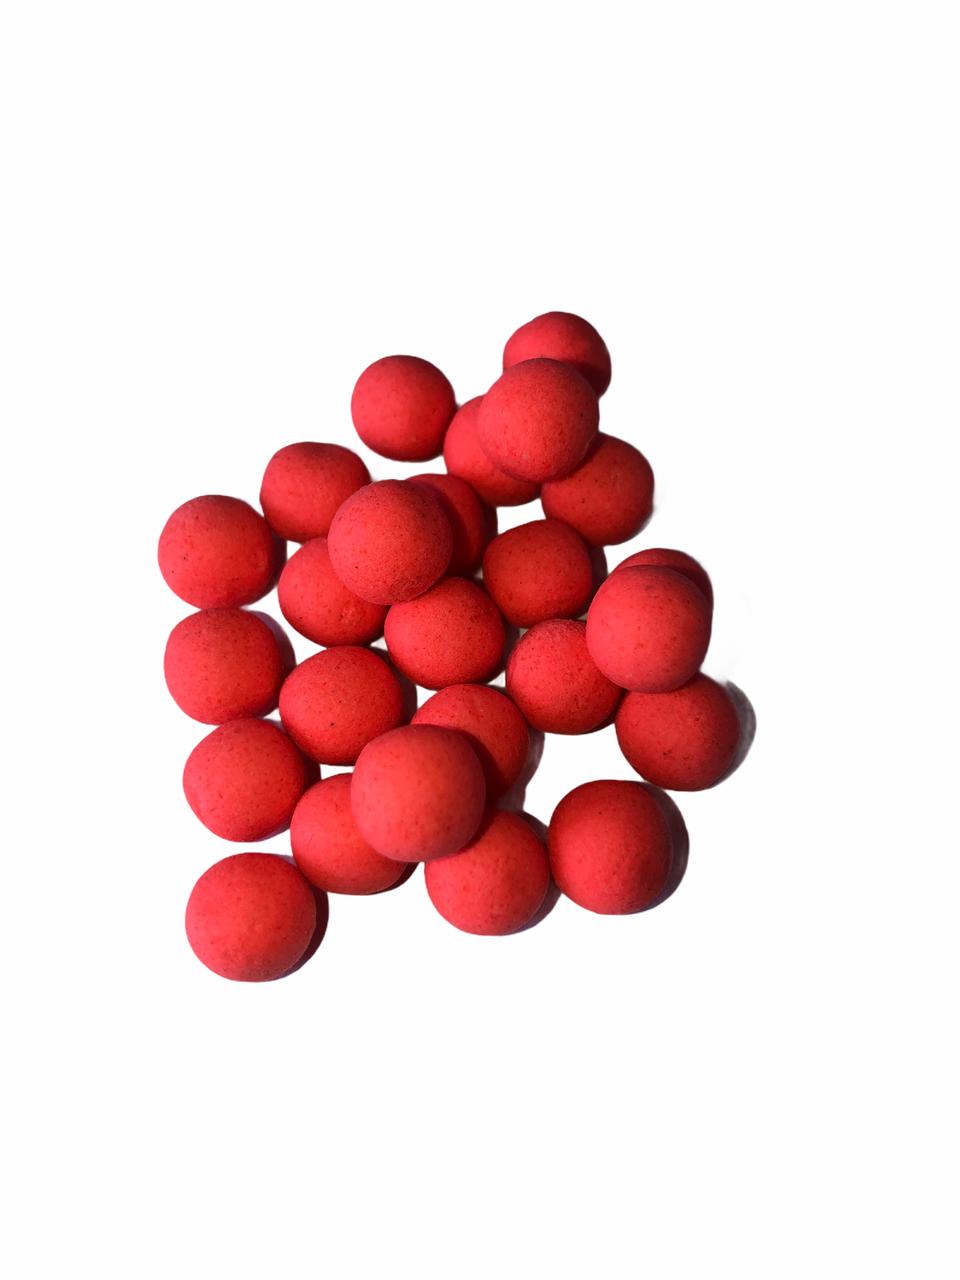 Бойл Профмонтаж Pop-Up d=10мм Клубника 16120